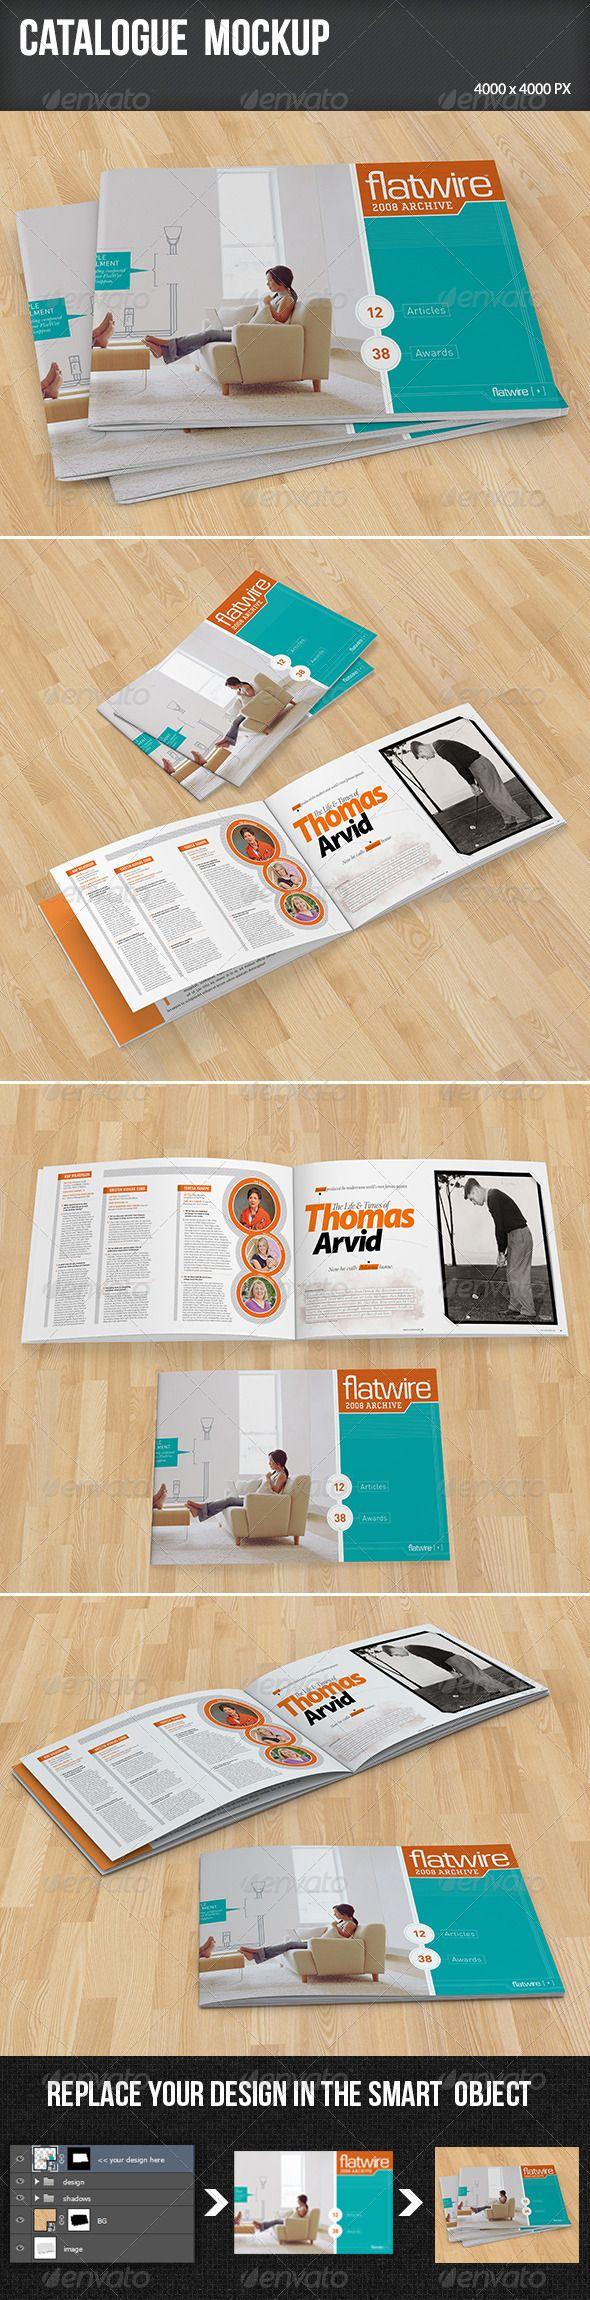 Catalogue Mockup